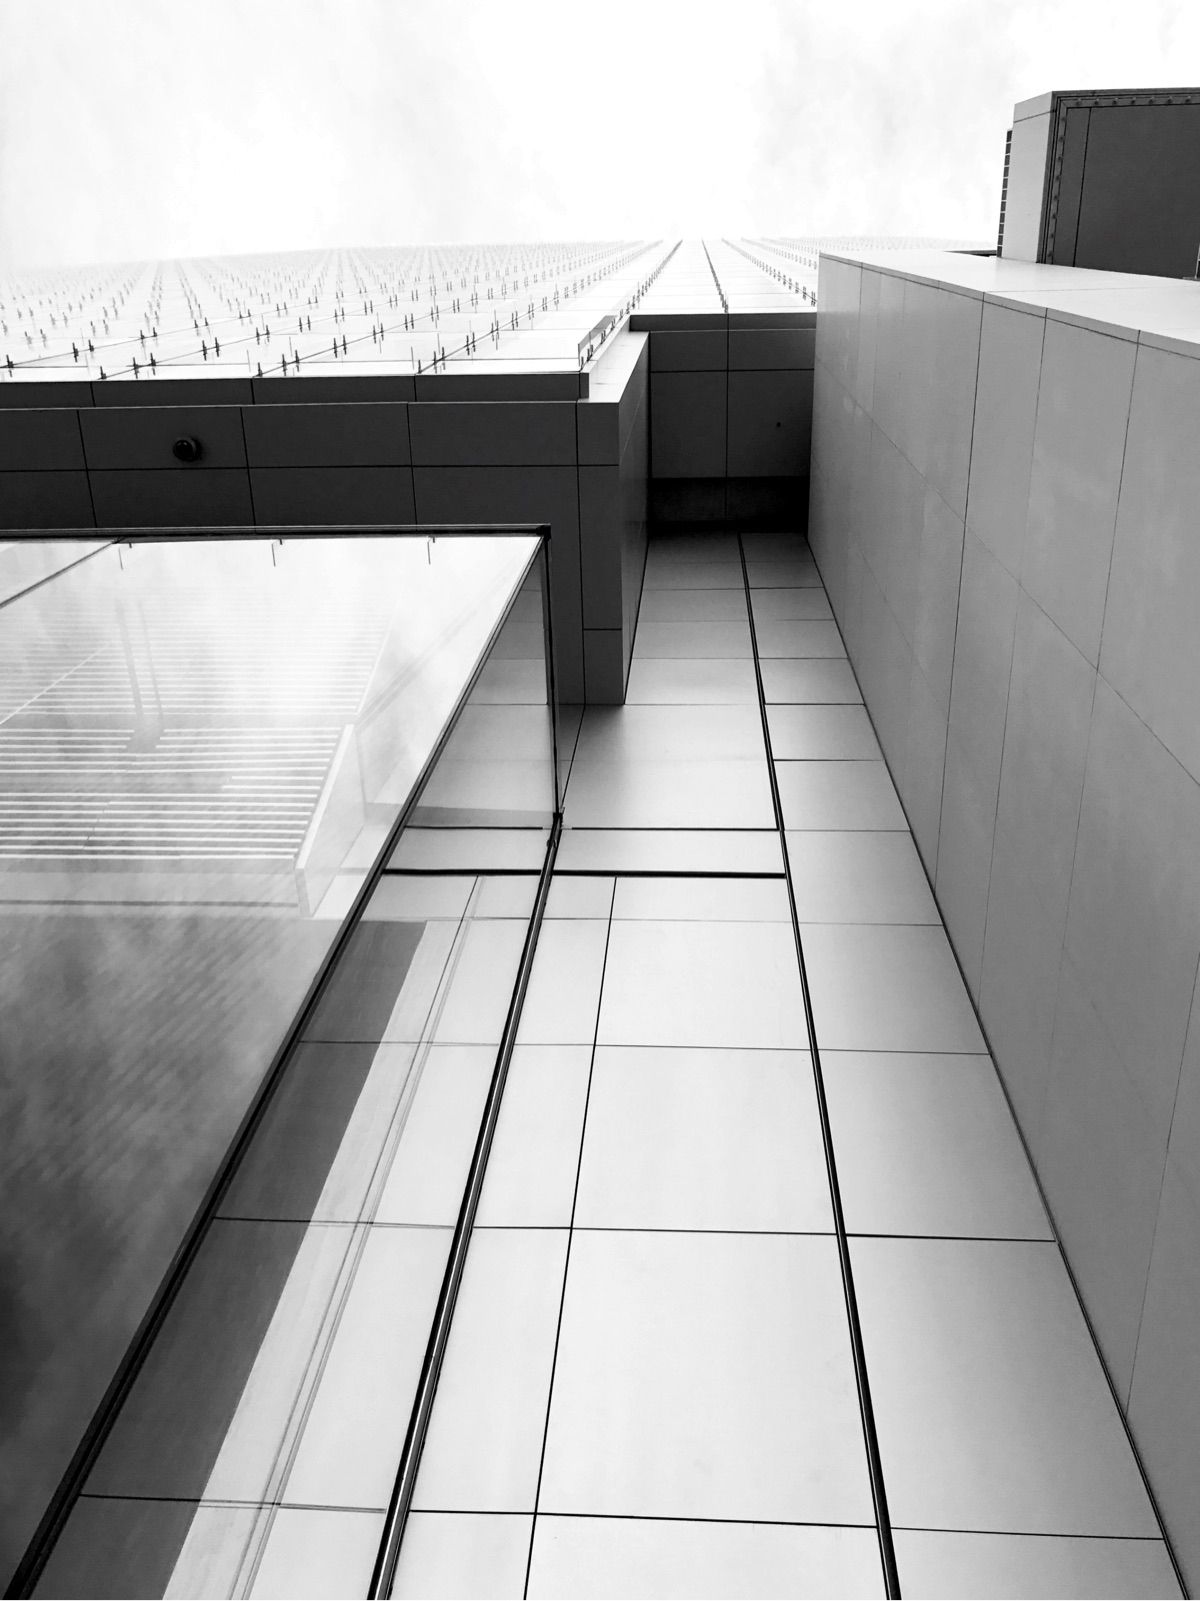 Lines Points - grantallen | ello